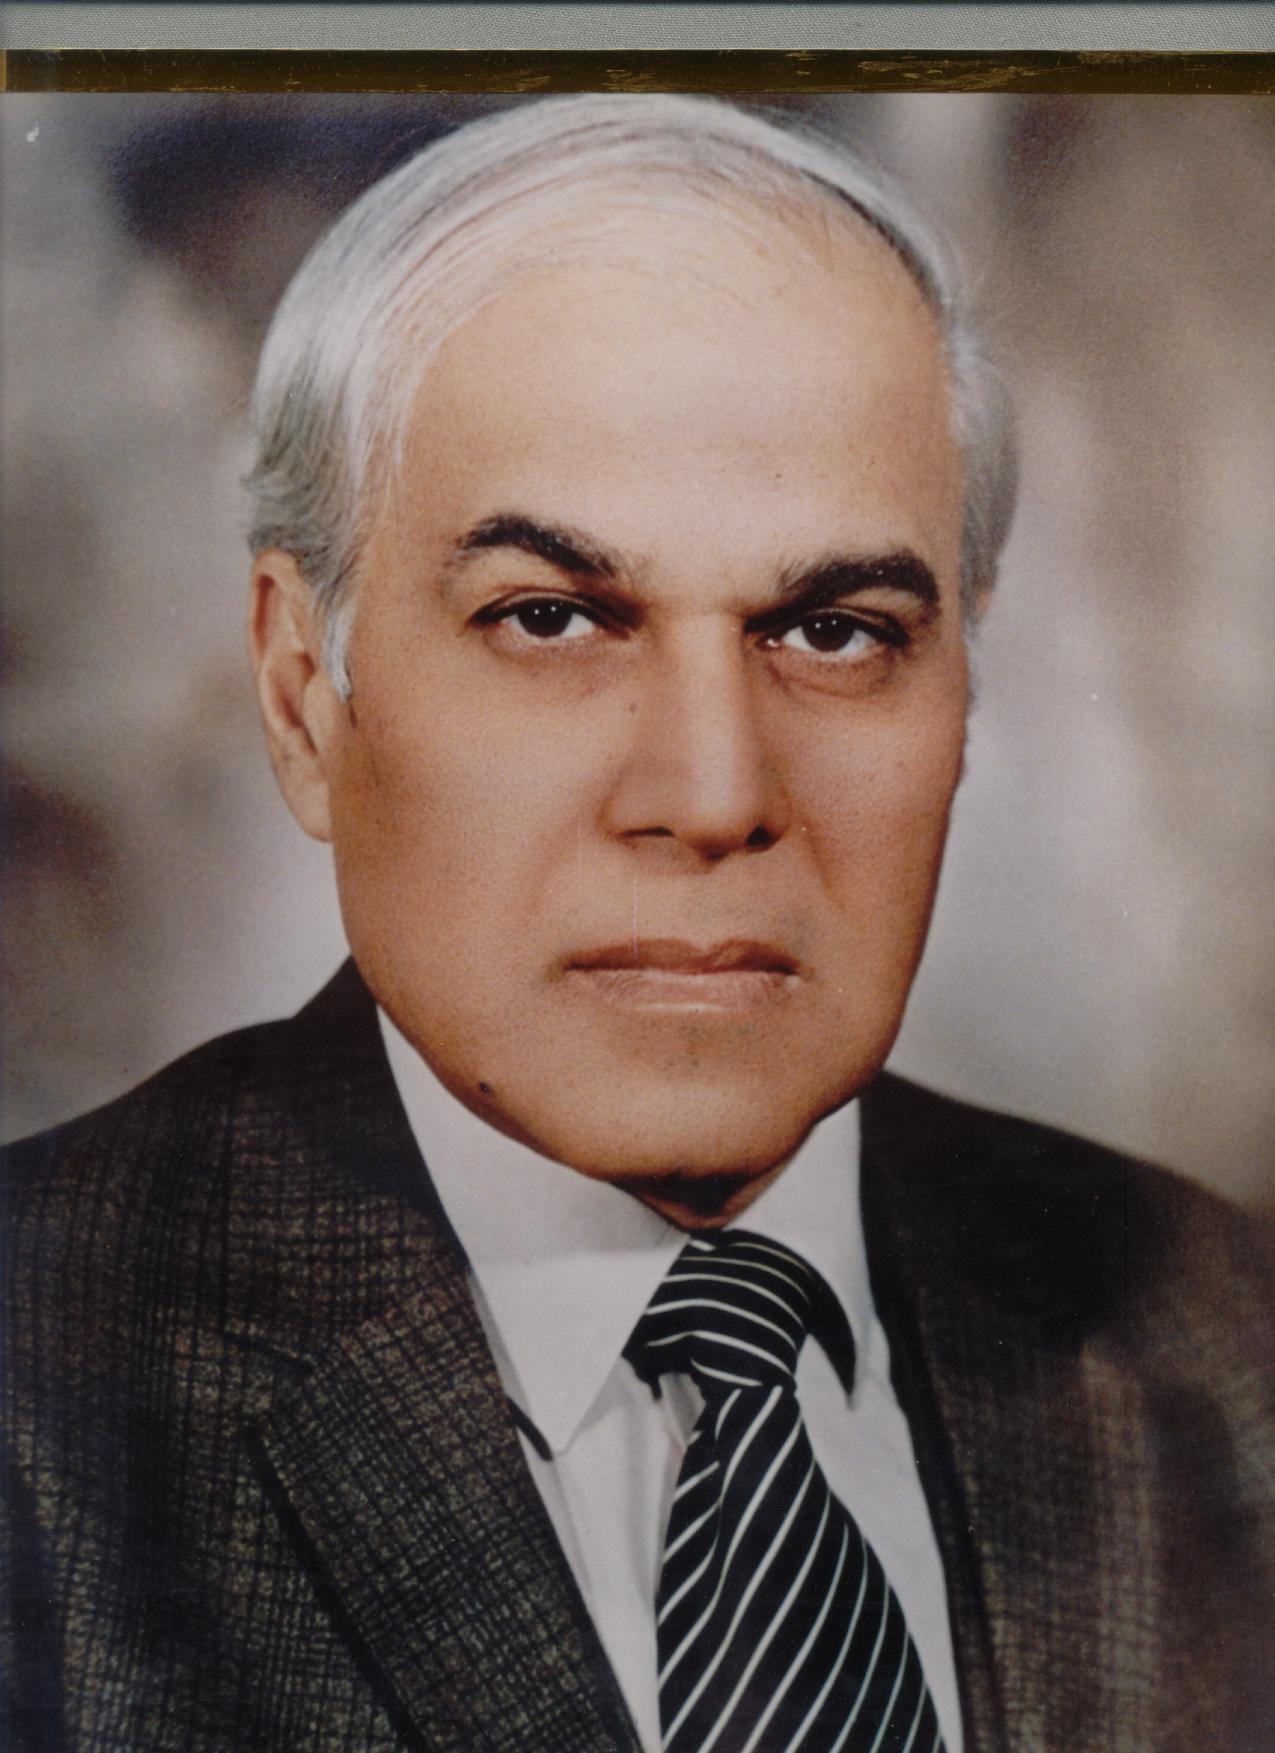 Dr. Iftikhar Maliik